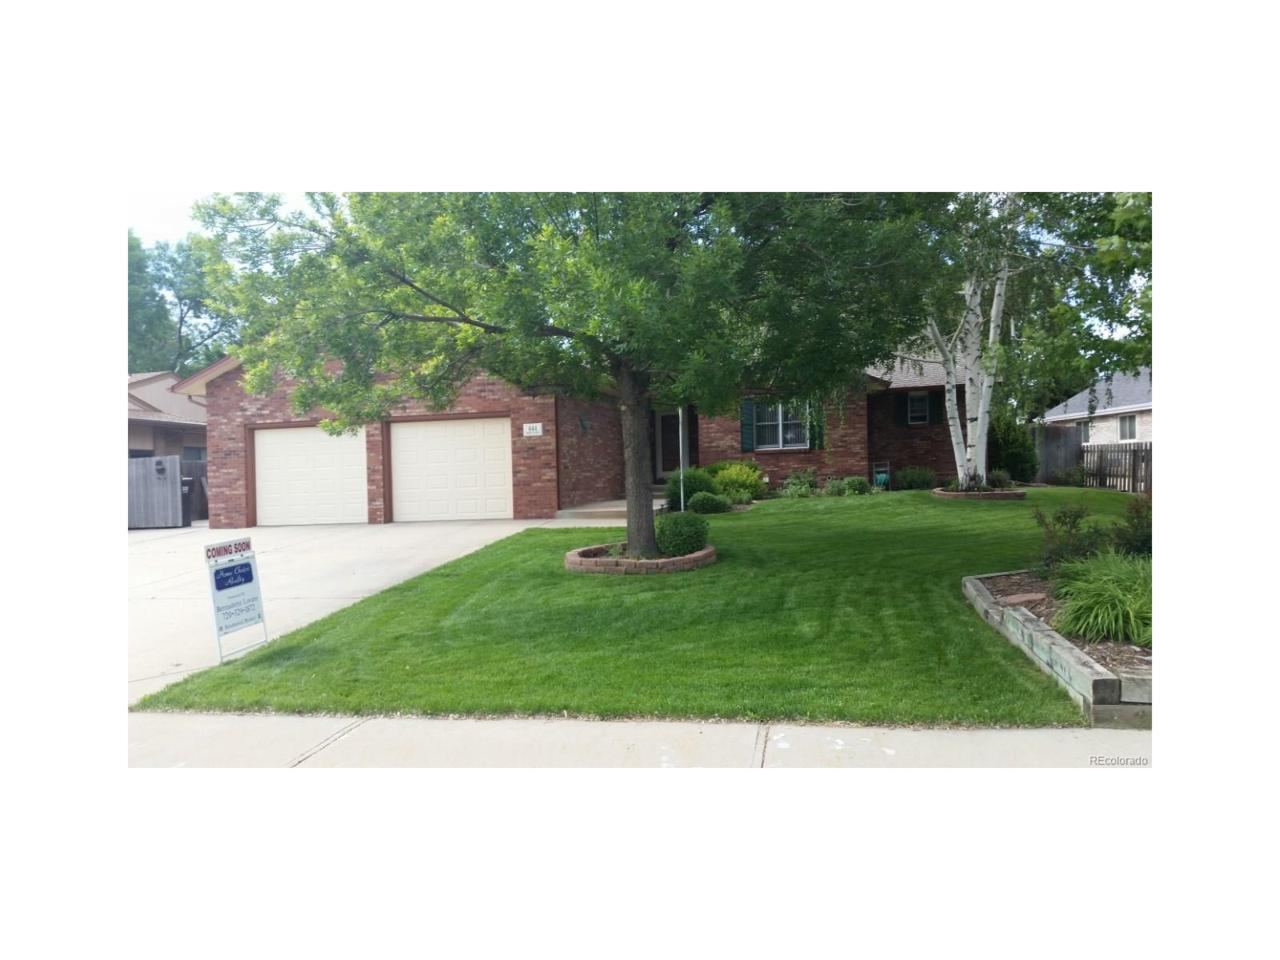 444 Sherilynn Circle, Firestone, CO 80520 (MLS #3888486) :: 8z Real Estate